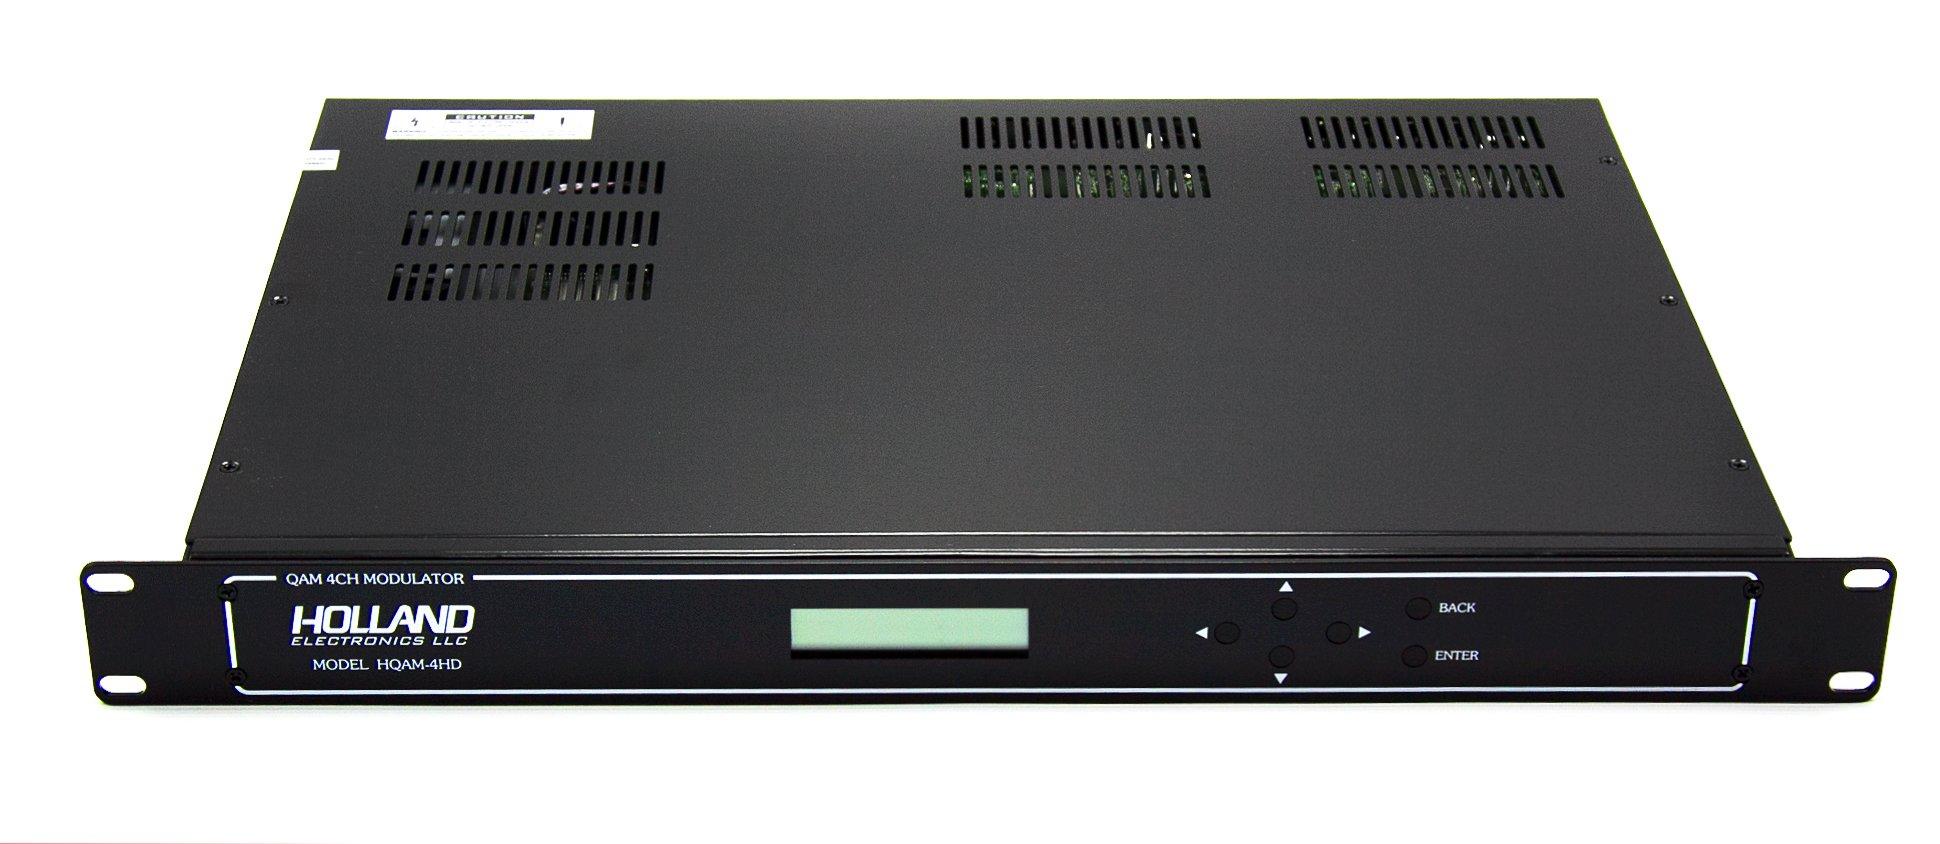 HQAM-4HD, Holland Electronics 4-Channel HD QAM Modulator